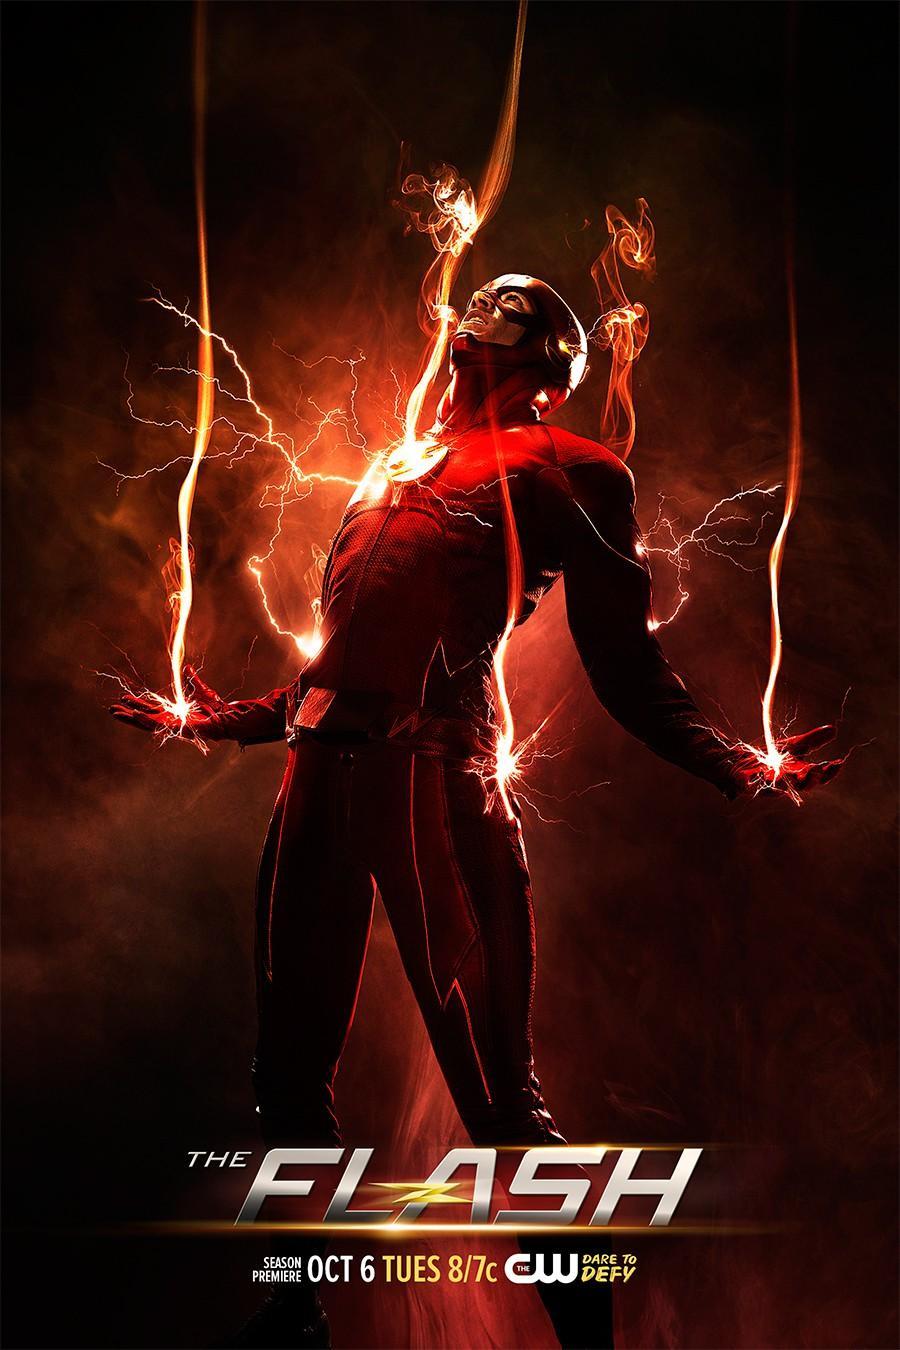 The%20Flash.7 1 دانلود سریال The Flash : قسمت آخر فصل ۴ اضافه شد